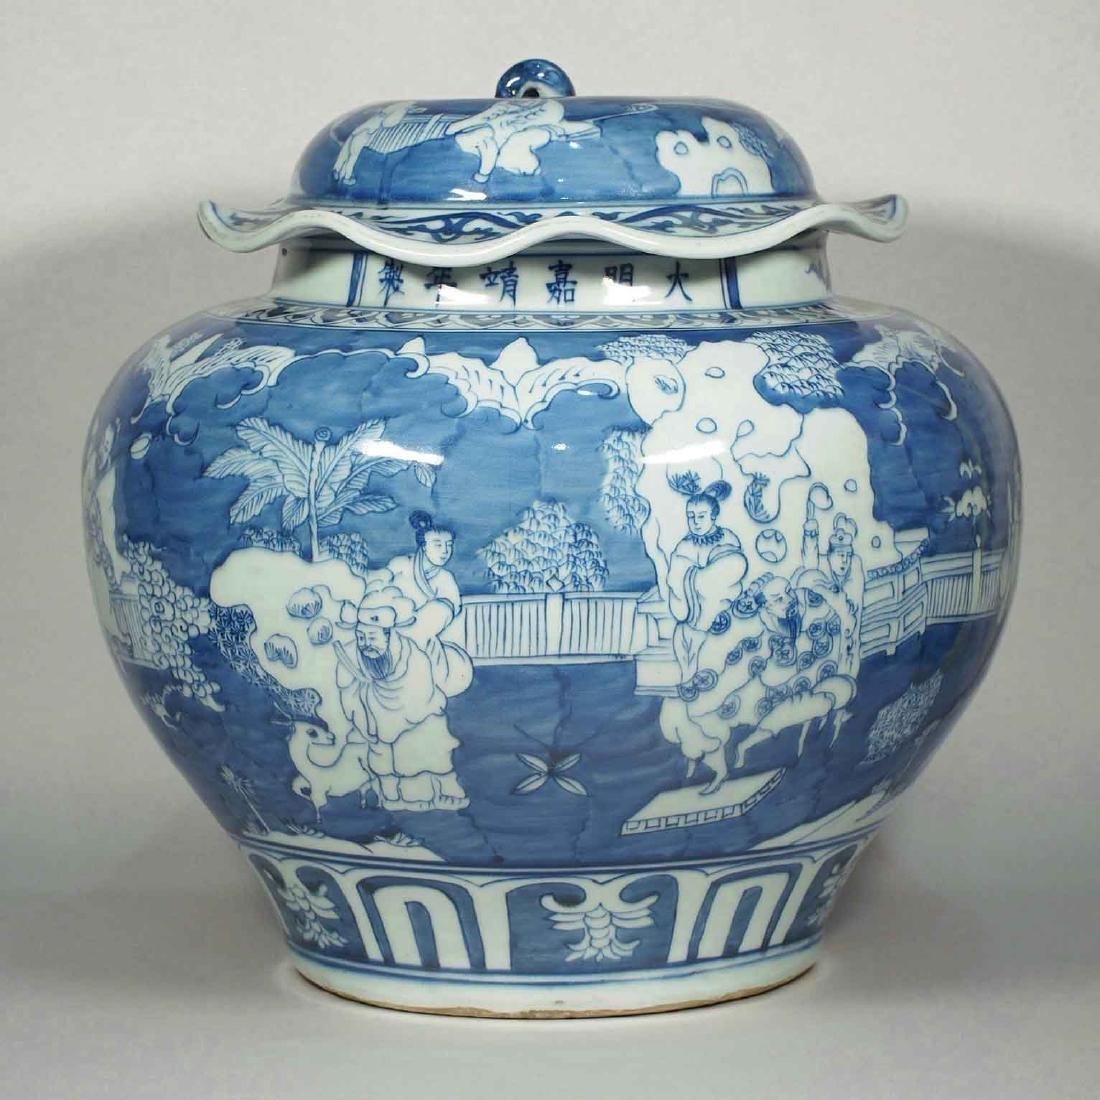 Lidded Jar with Narrative Scenes, Jiajing Mark, Ming